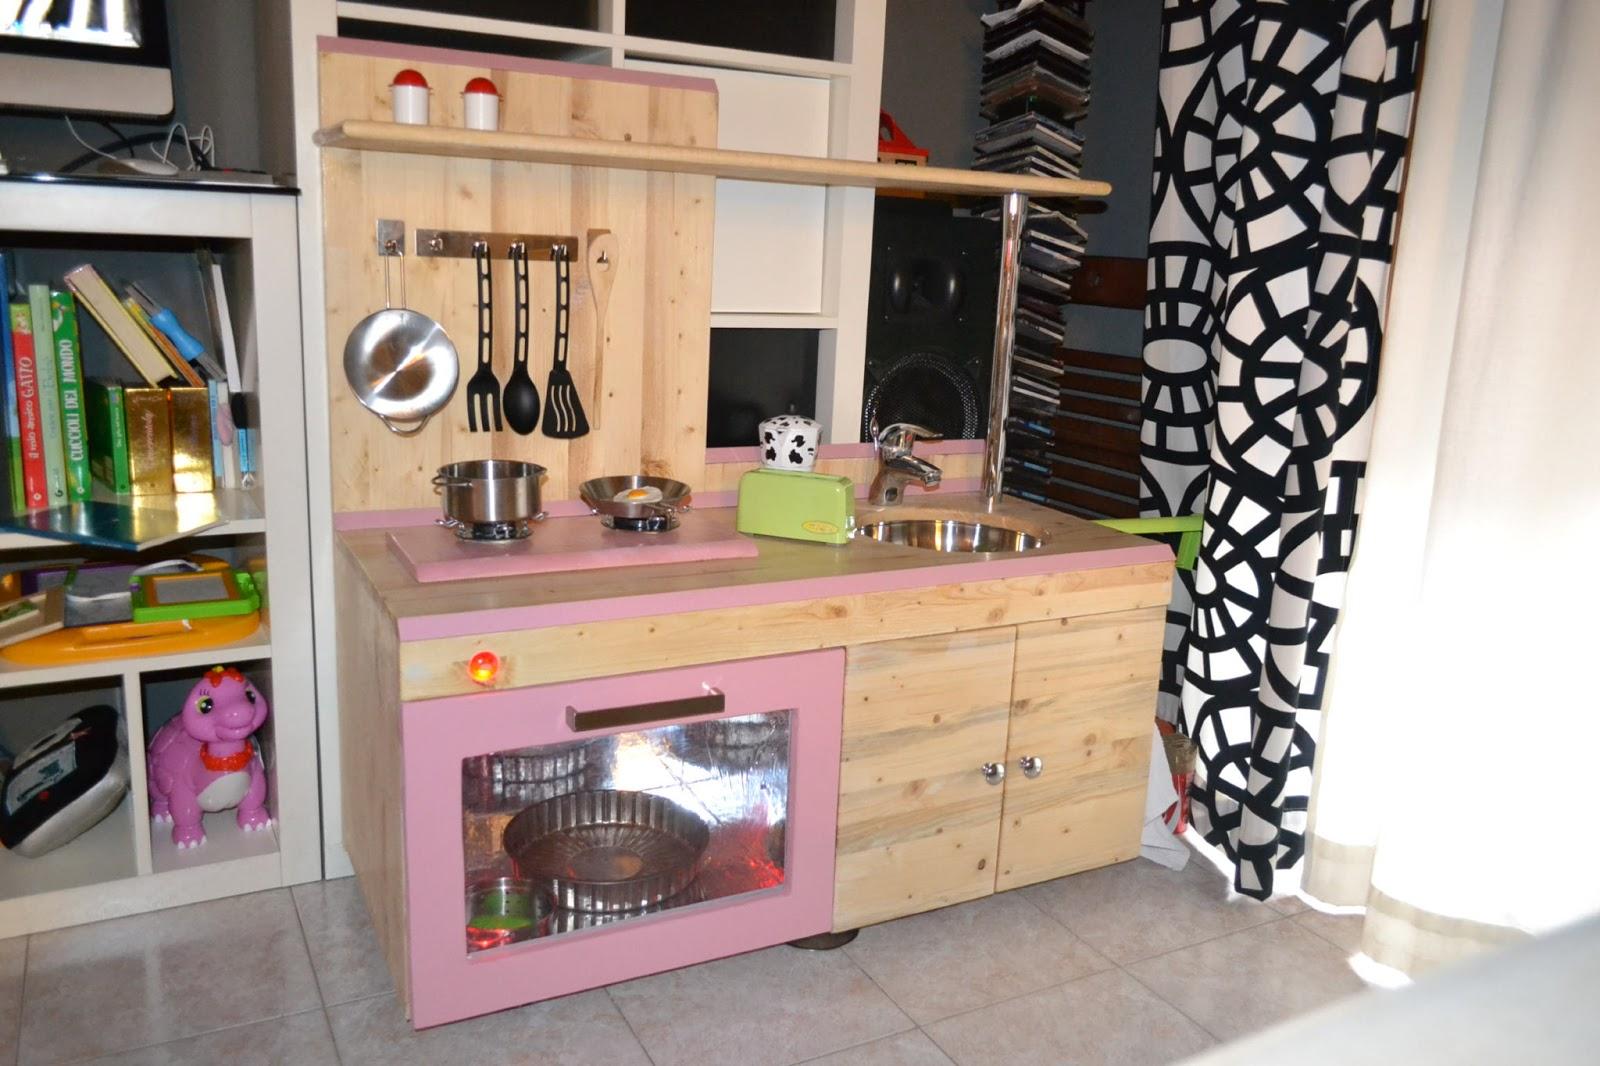 Mammarum come costruire una cucina per bambini di legno - Pomelli per cucina ...